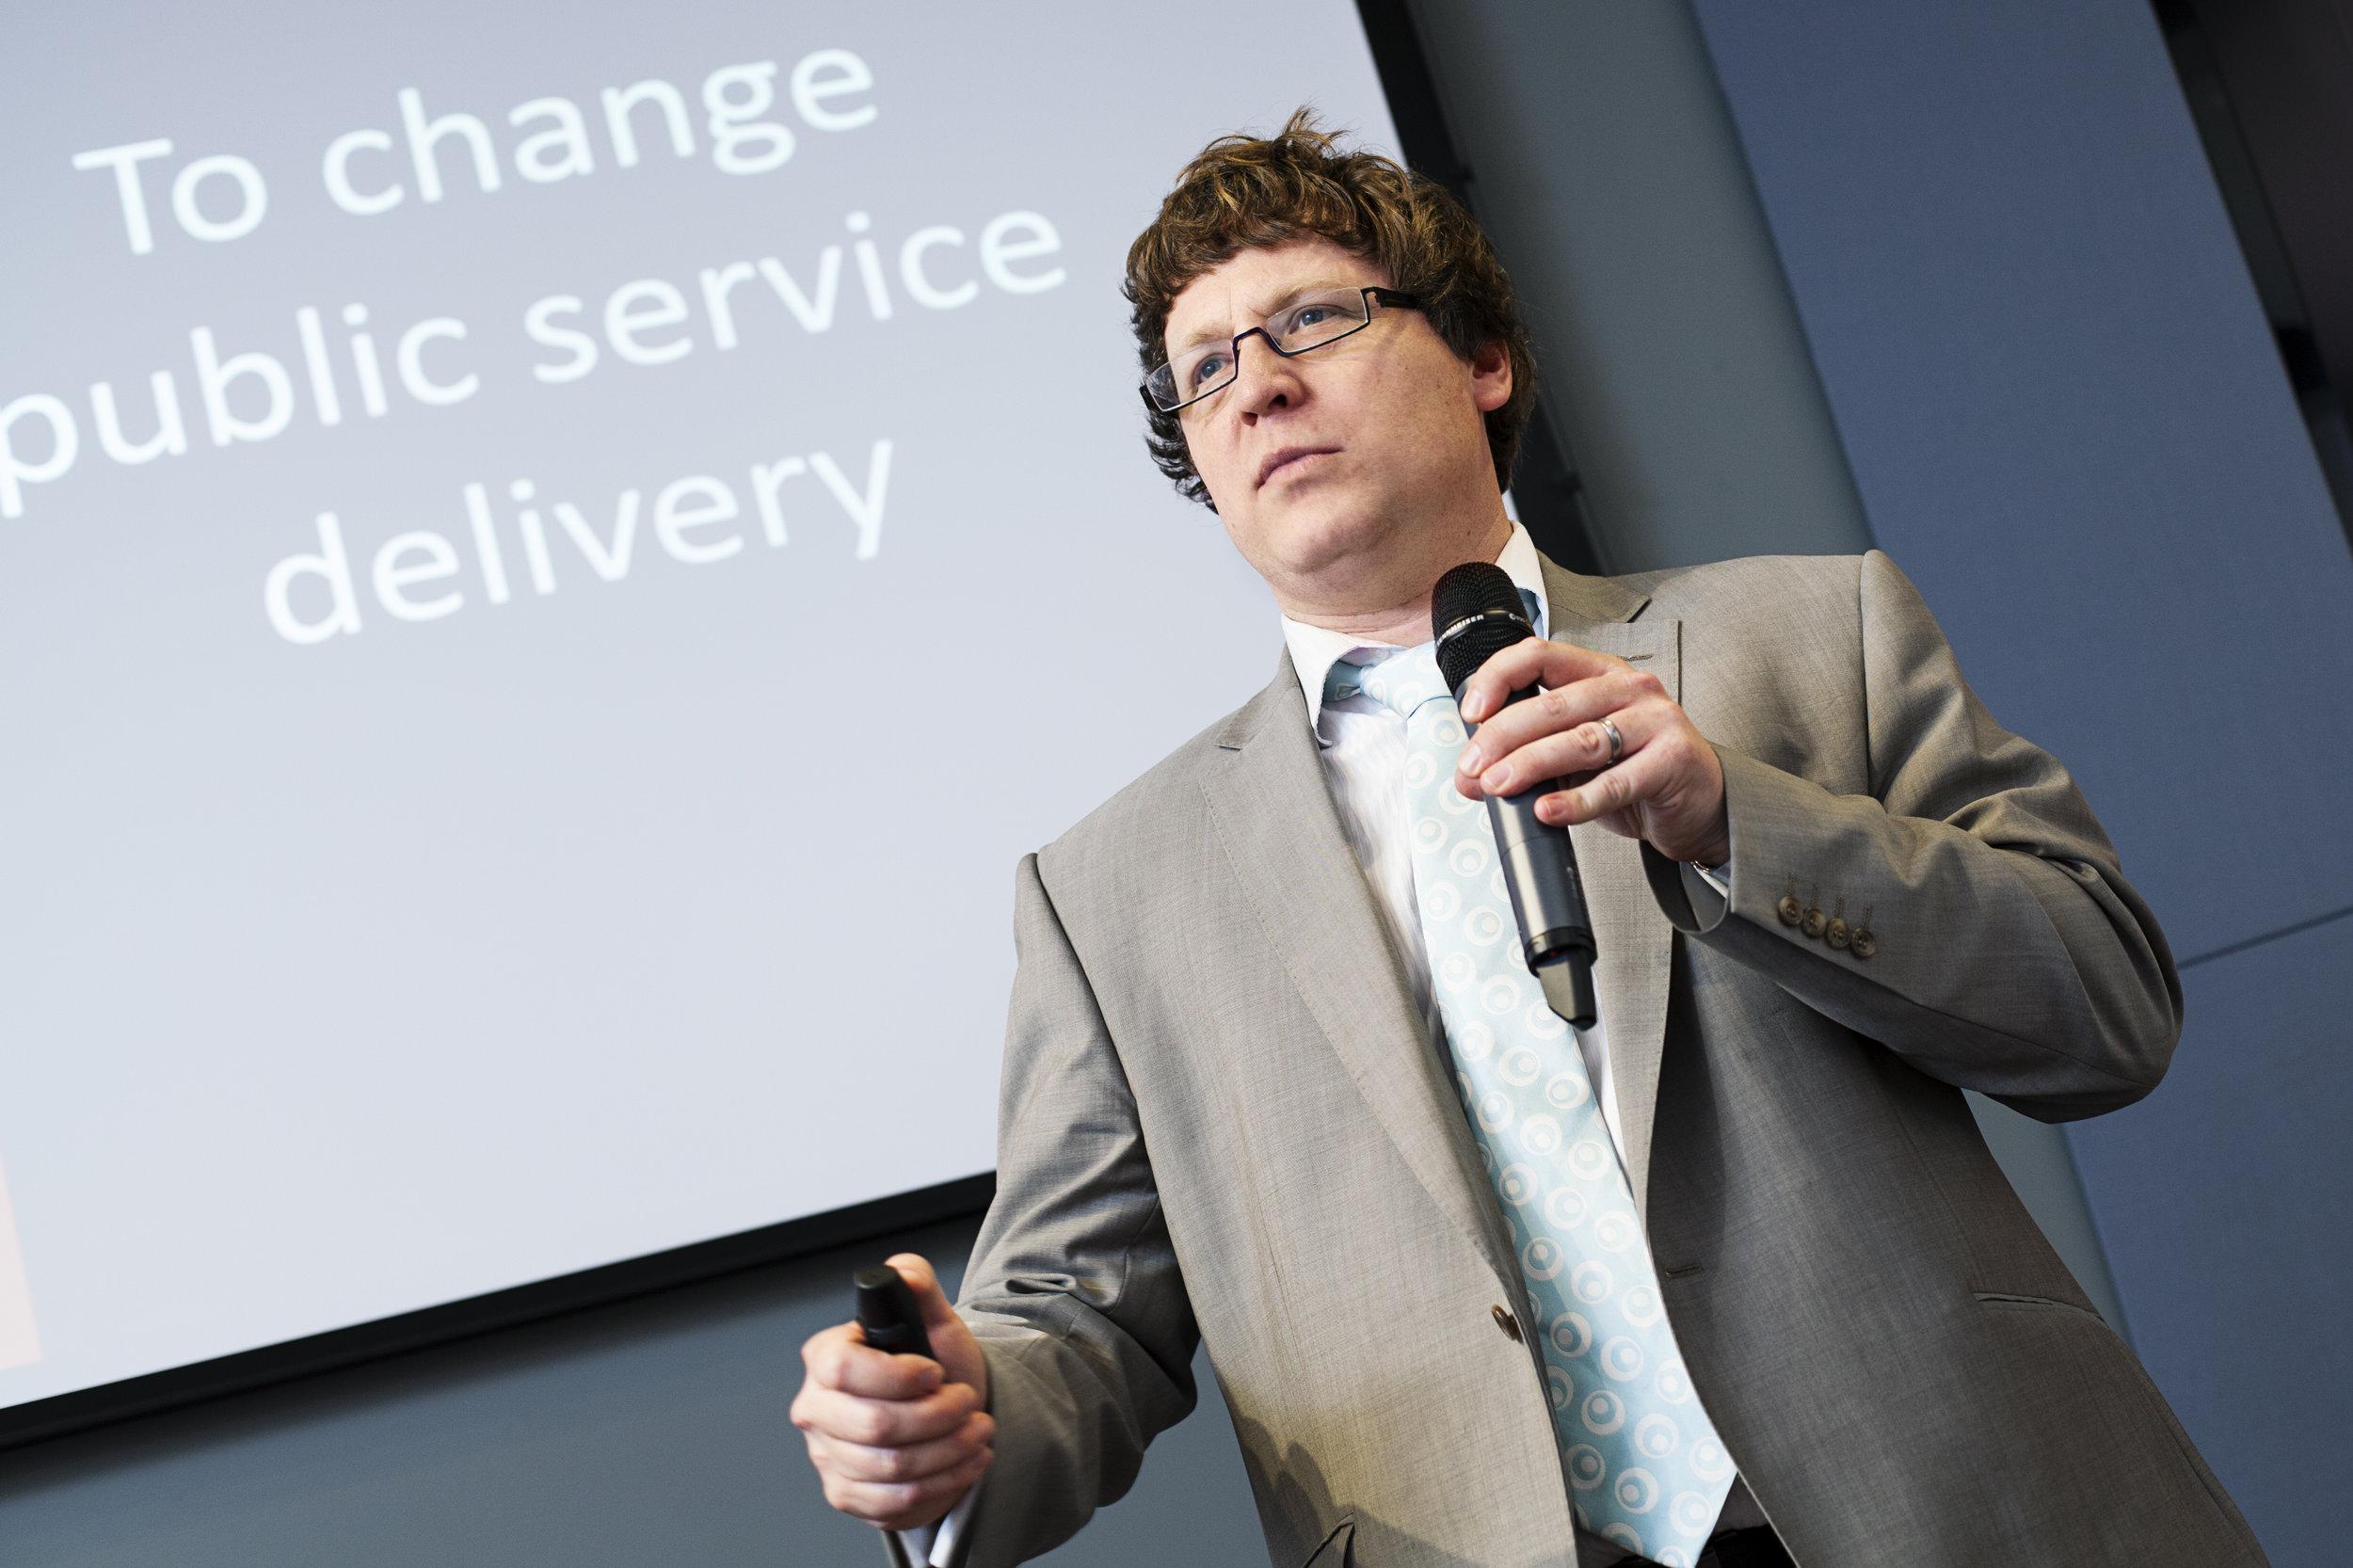 Benjamin Taylor, of RedQuadrant, talks about service design in the public sector.